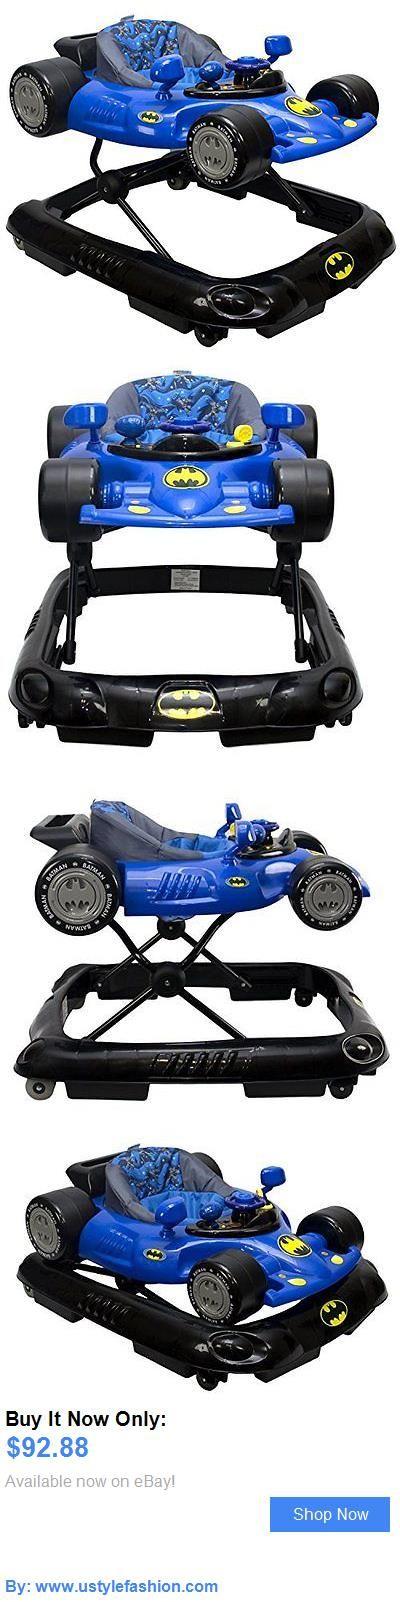 Baby walkers: Kidsembrace Baby Walker, Batman BUY IT NOW ONLY: $92.88 #ustylefashionBabywalkers OR #ustylefashion